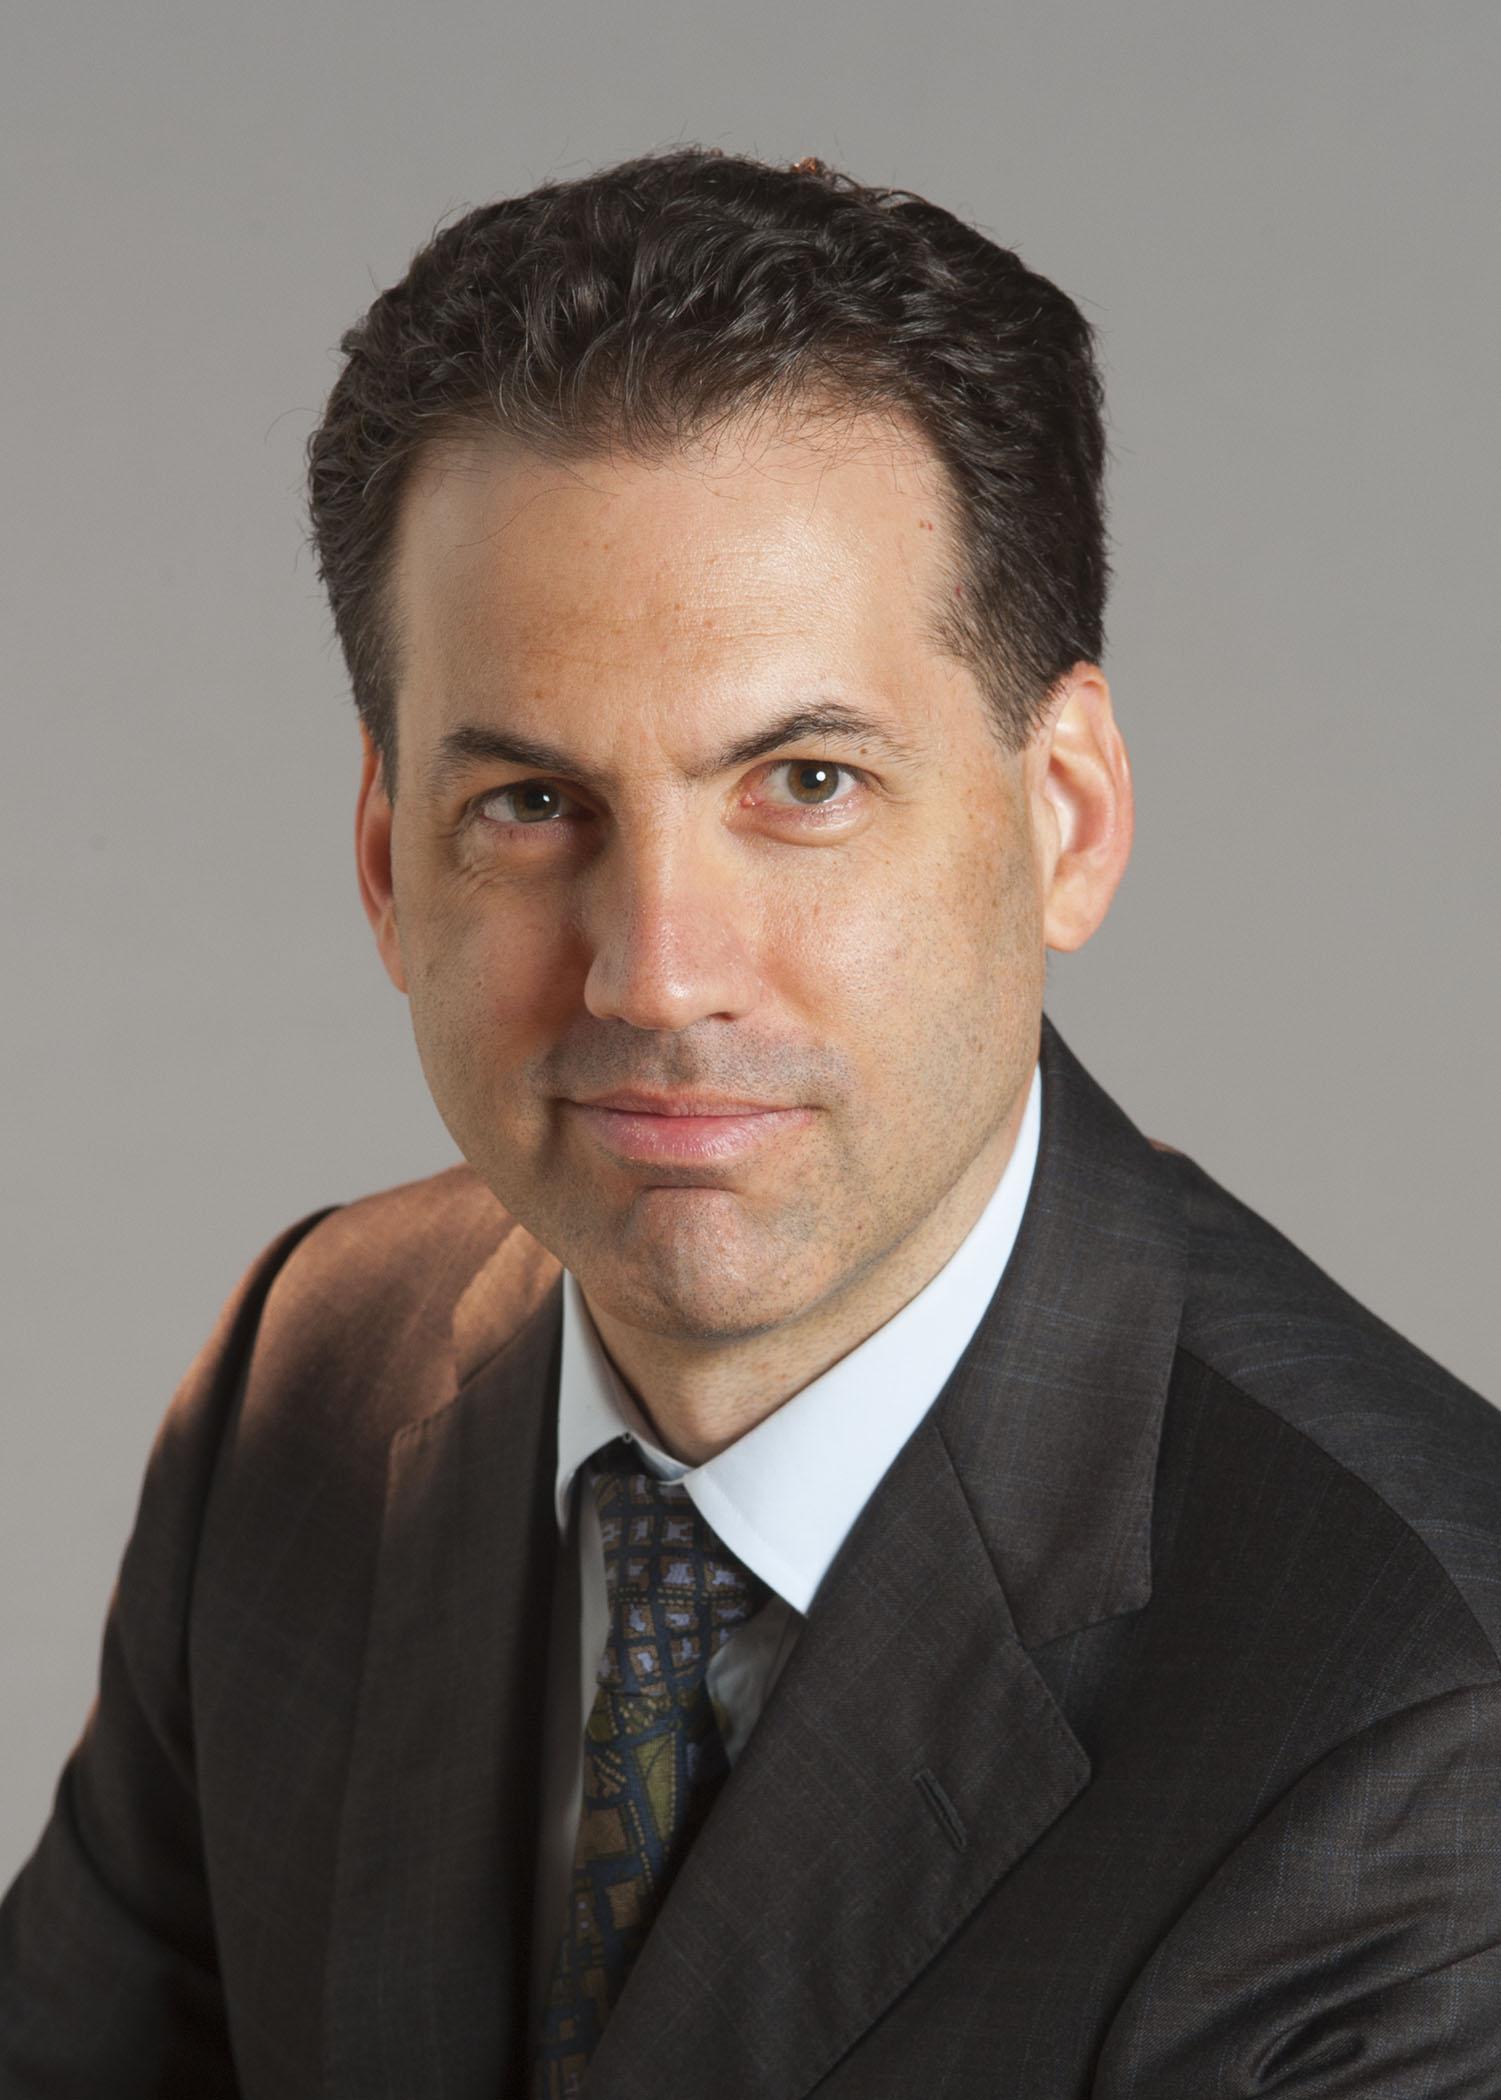 Portrait of Andrew Johnston